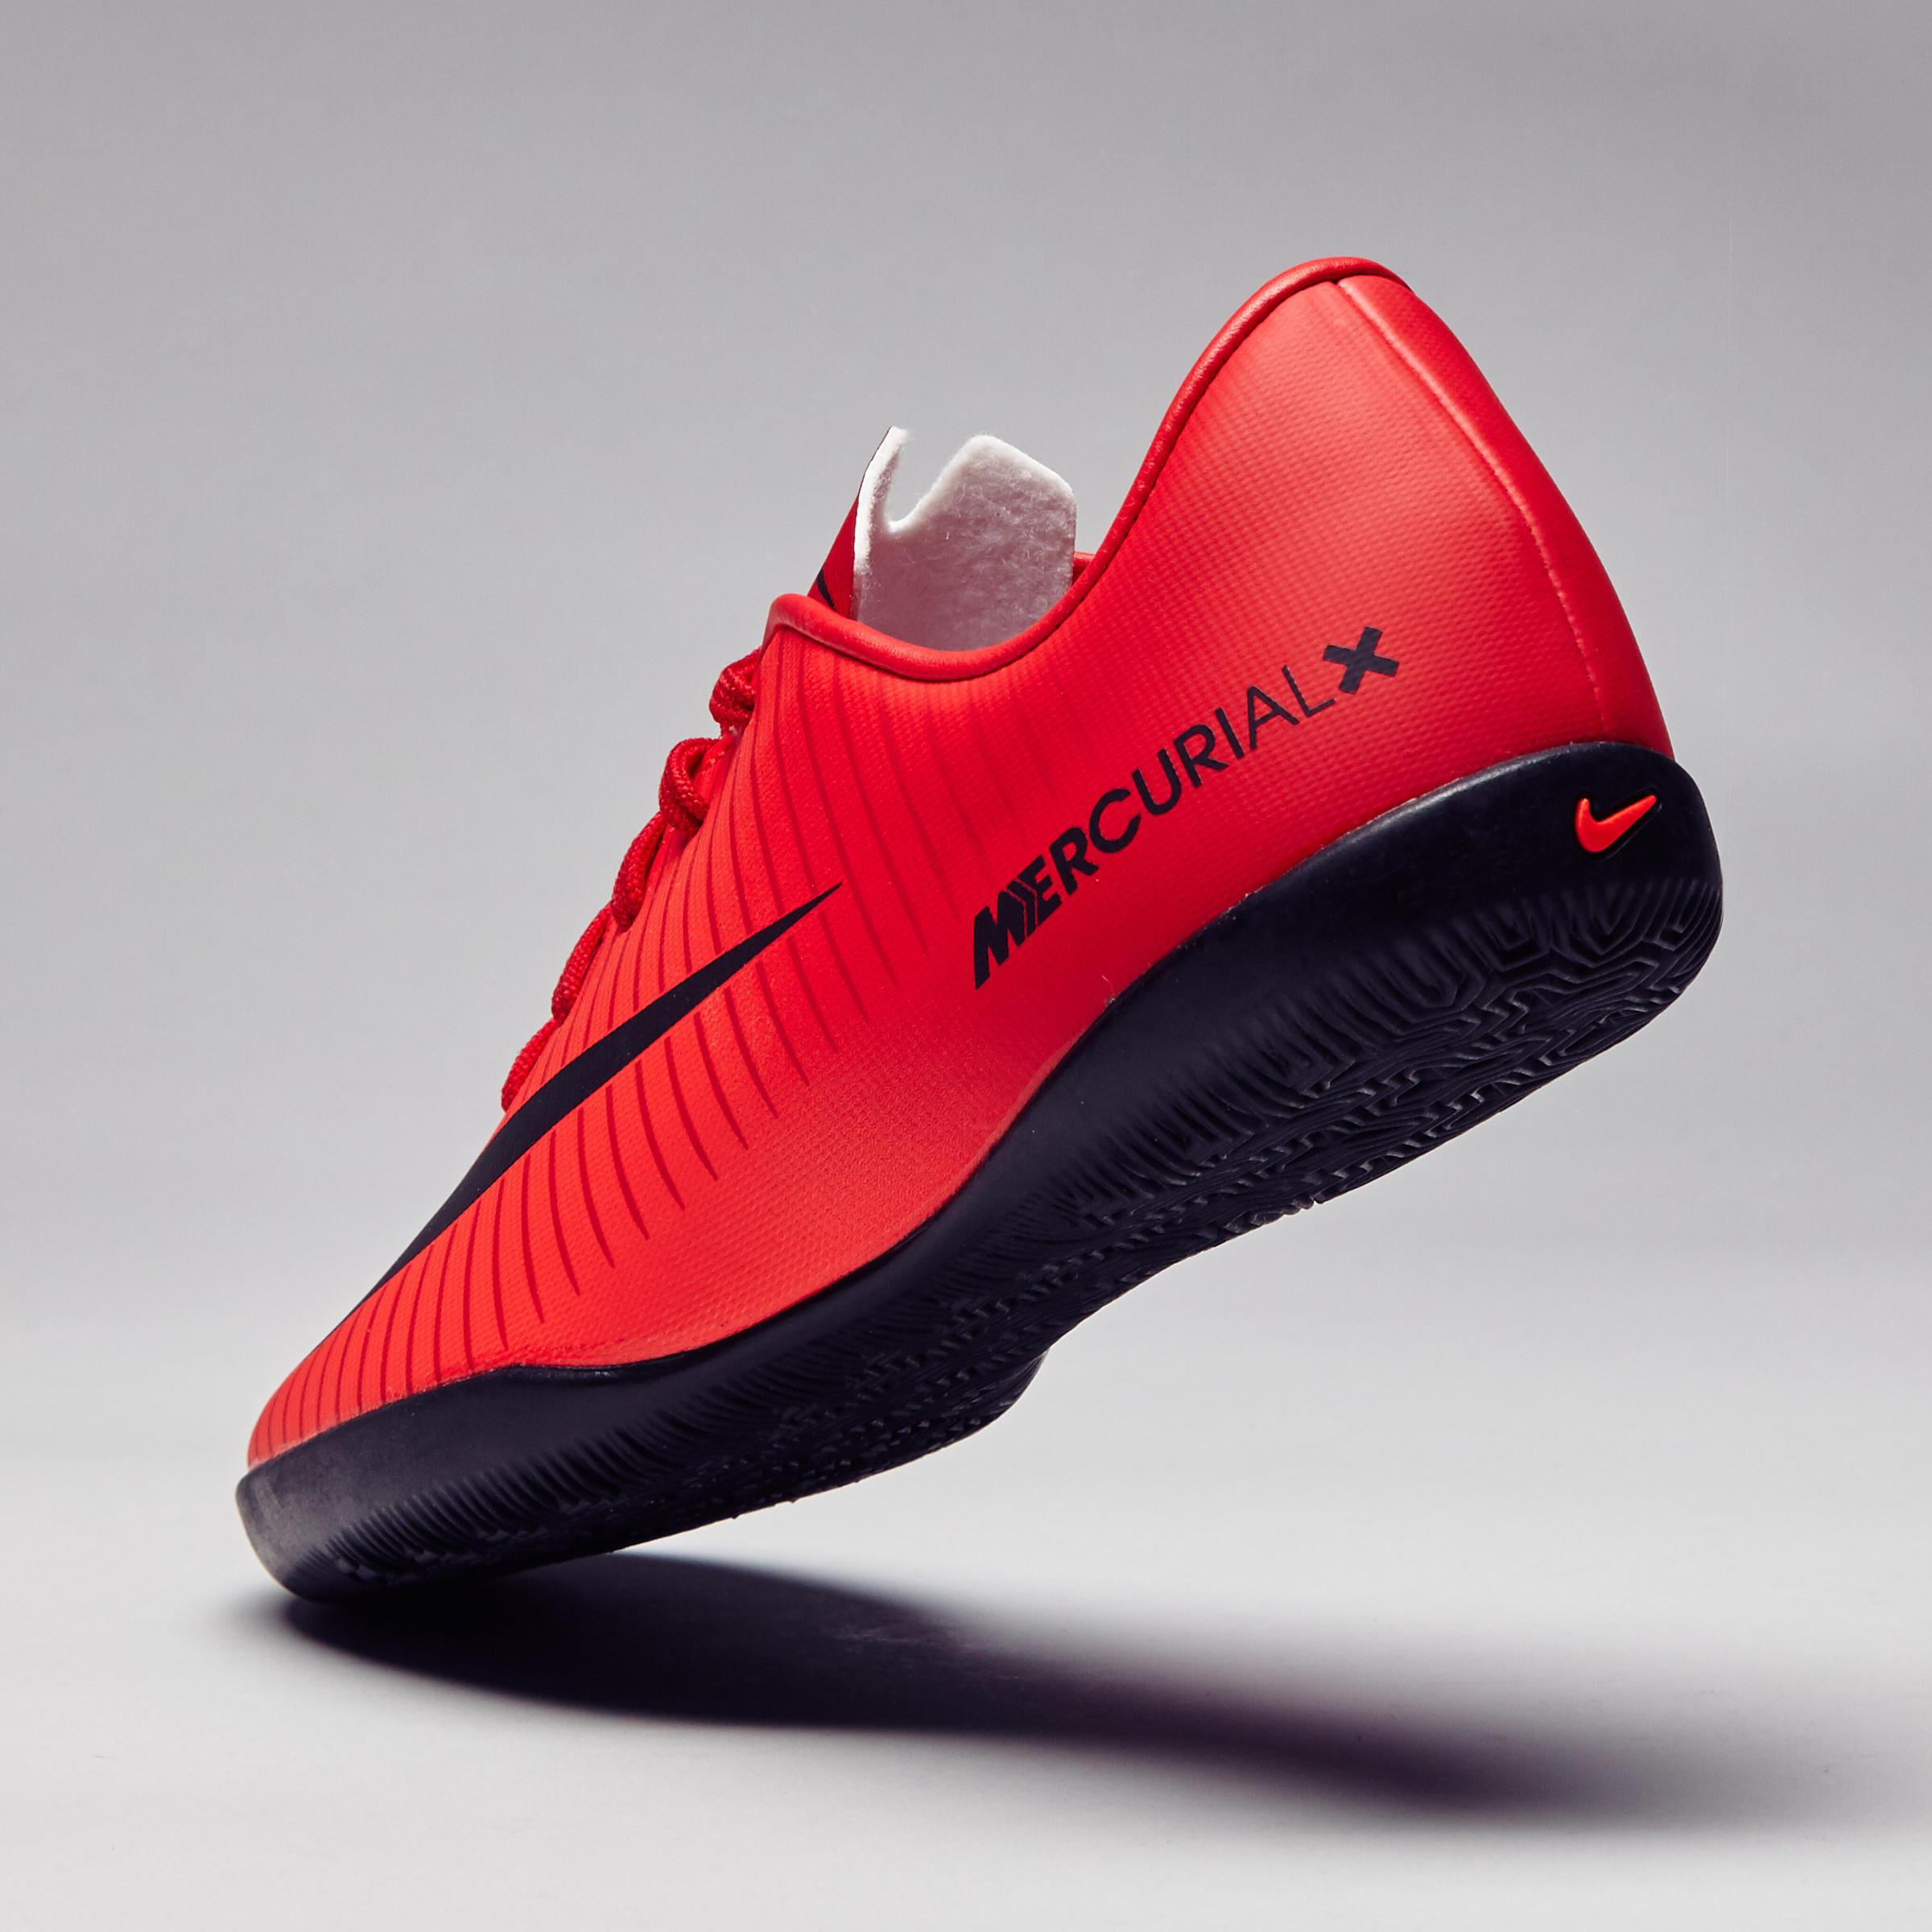 X Chaussure De Futsal Victory Enfant Mercurial Rouge nNwkX0OP8